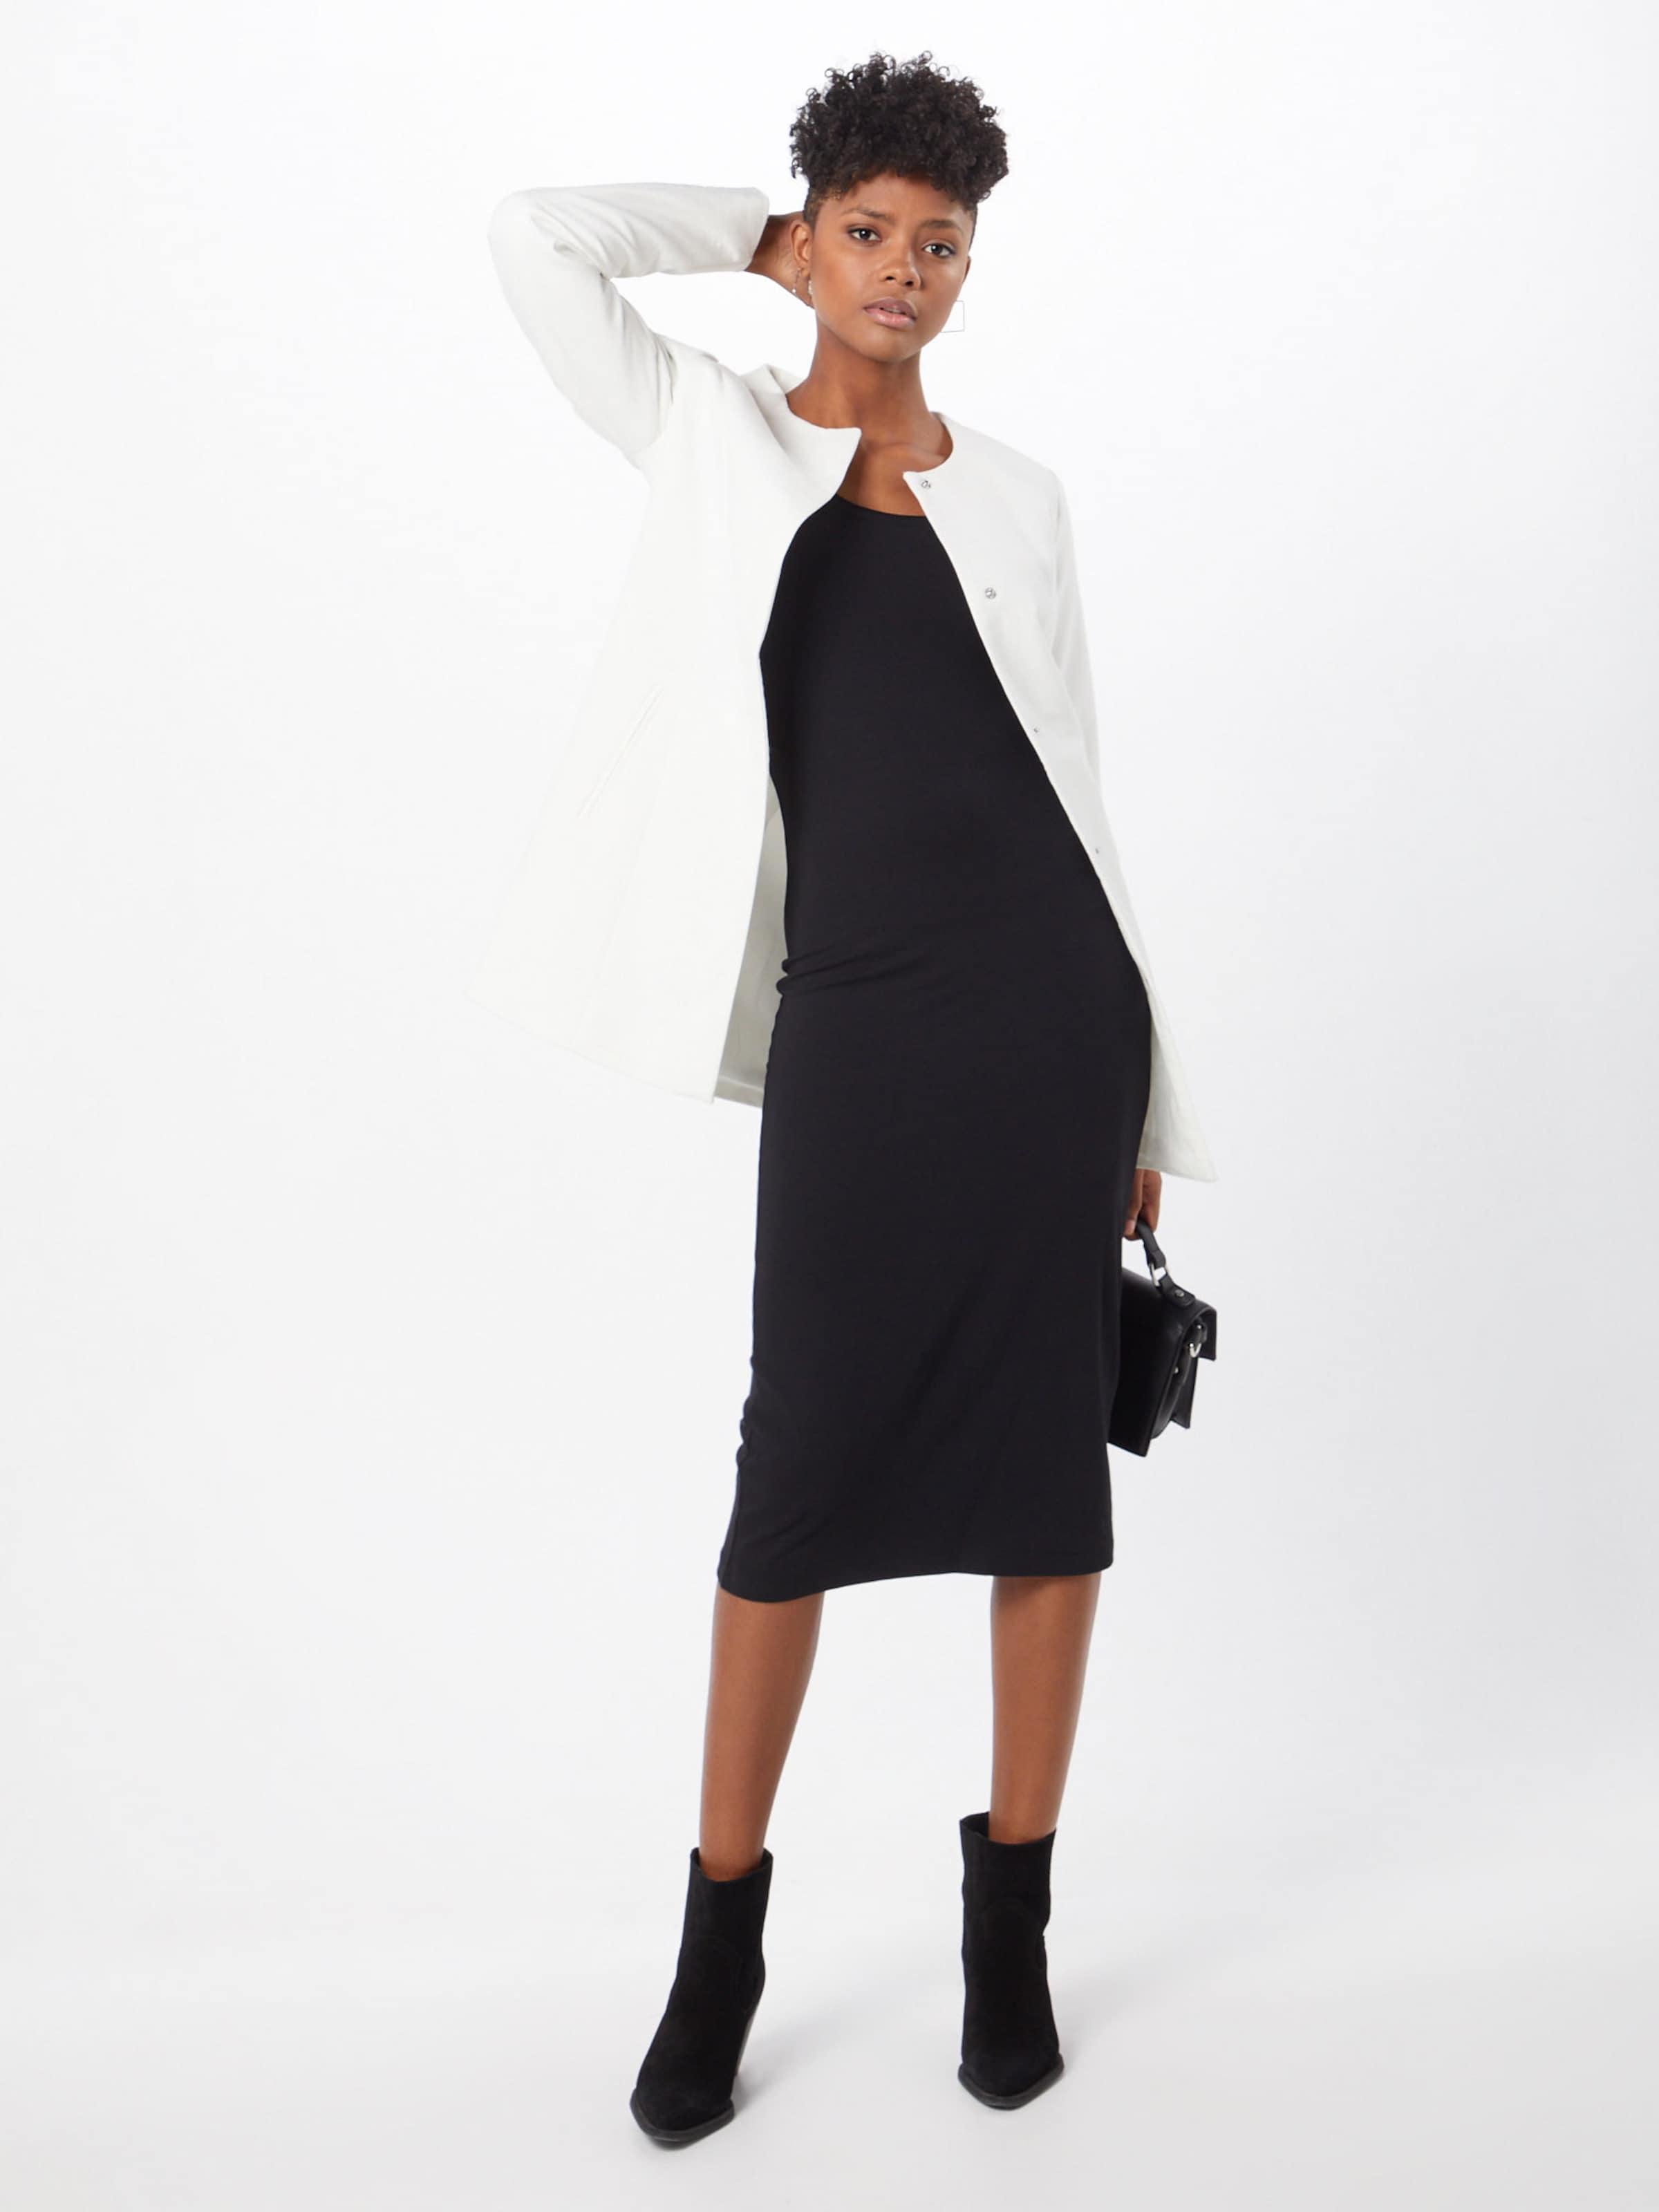 Manteau En saison Noir Yong Jacqueline 'new Brighton' De Mi oerxCdB